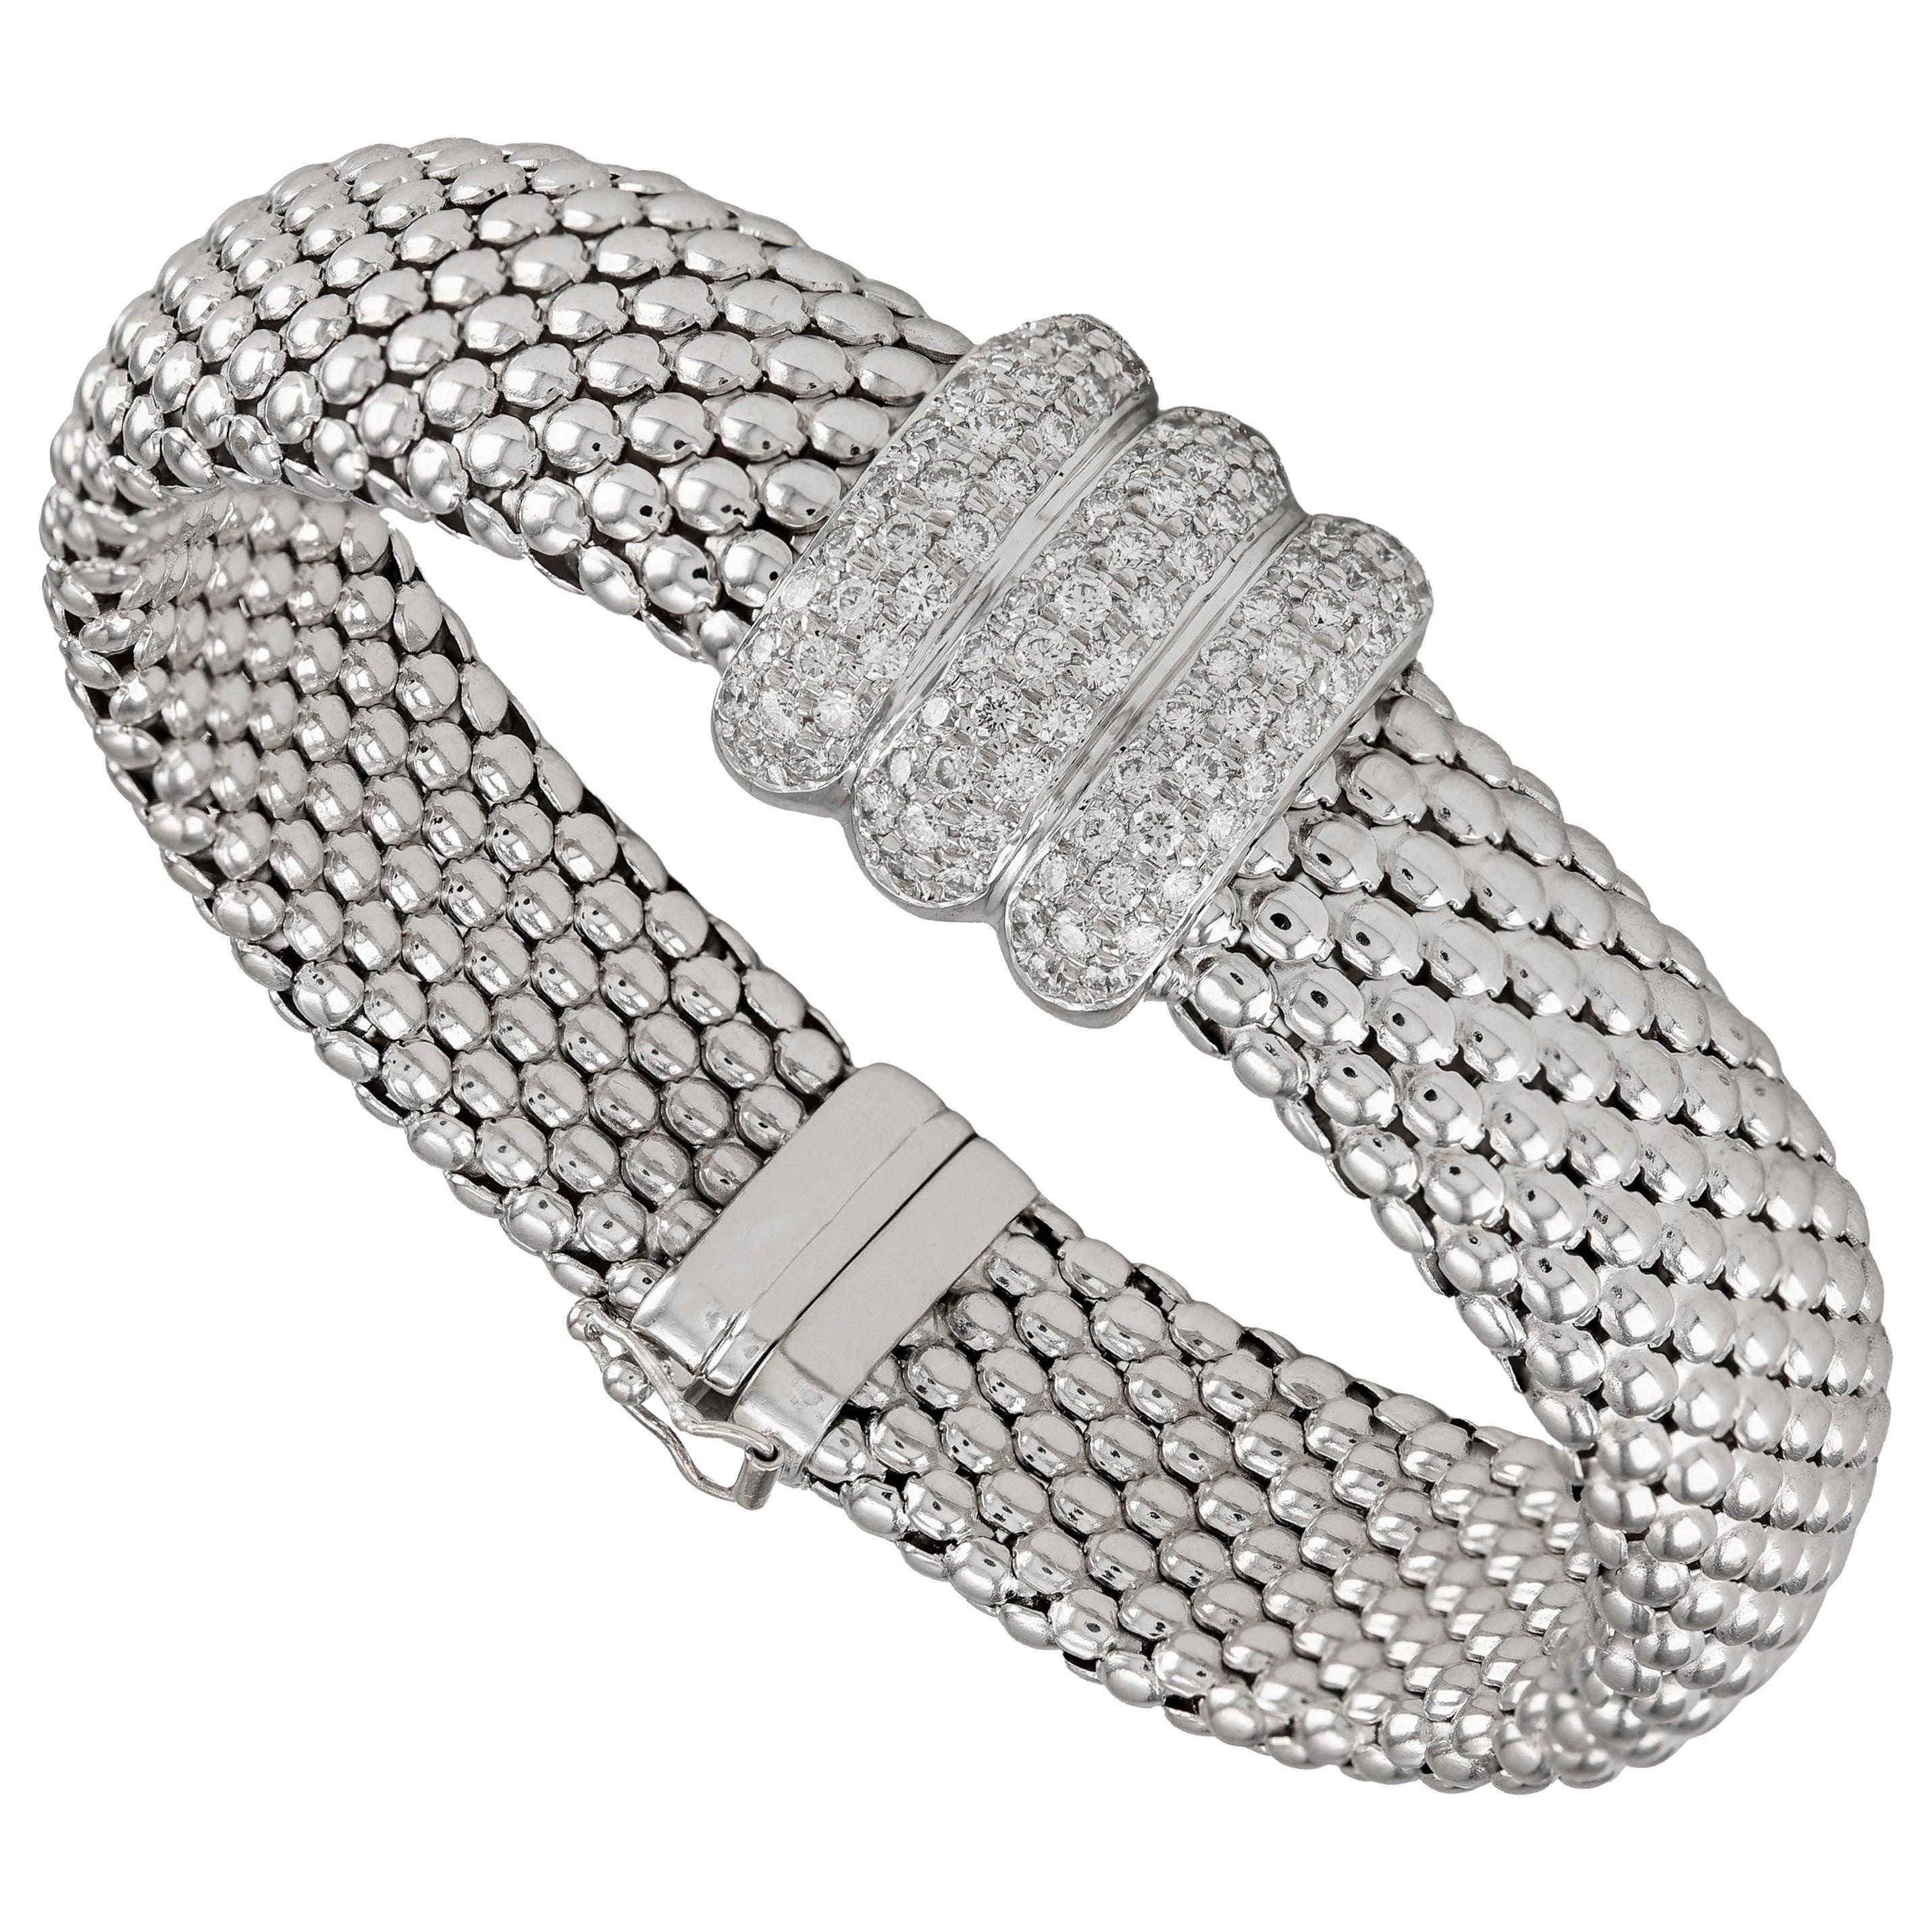 18 Karat White Gold Mesh 1.50 Carat Pavé Diamond Bracelet